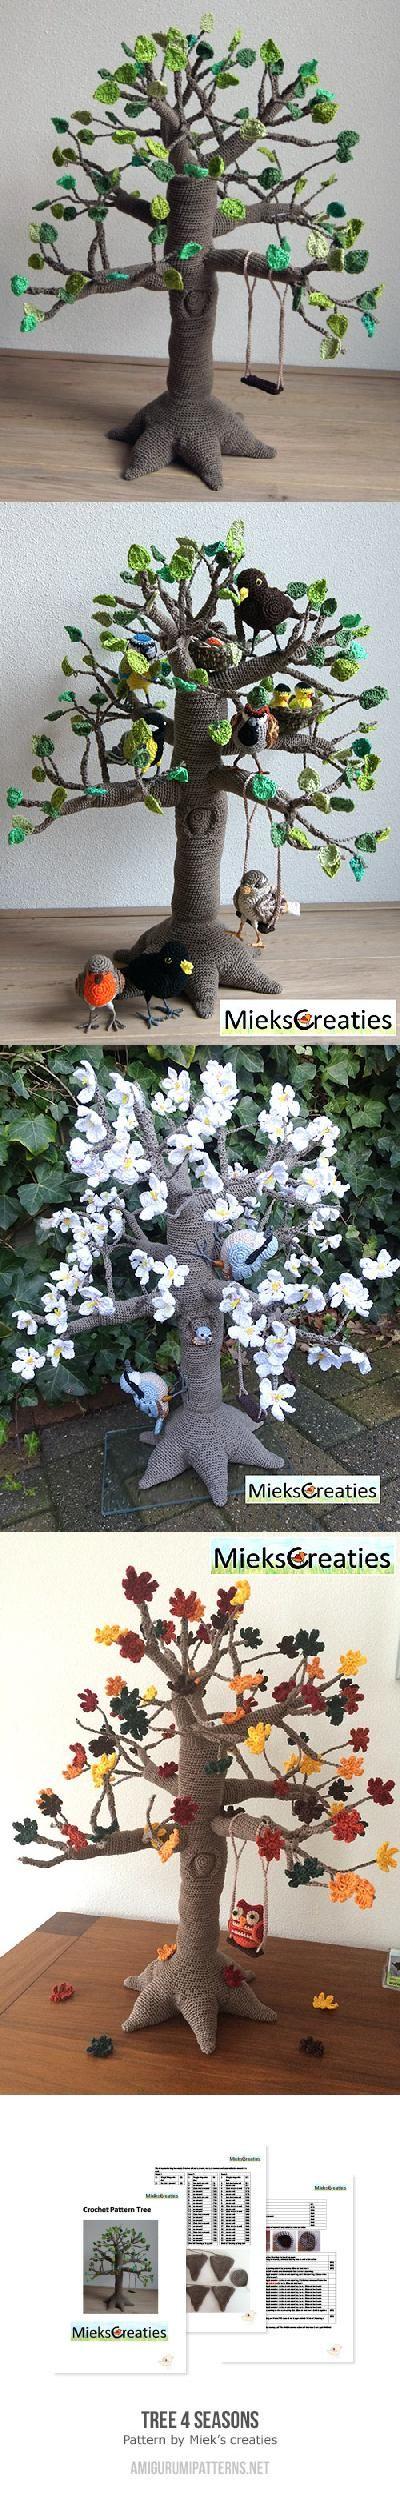 Amigurumi #crochet tree | Found at Amigurumipatterns.net